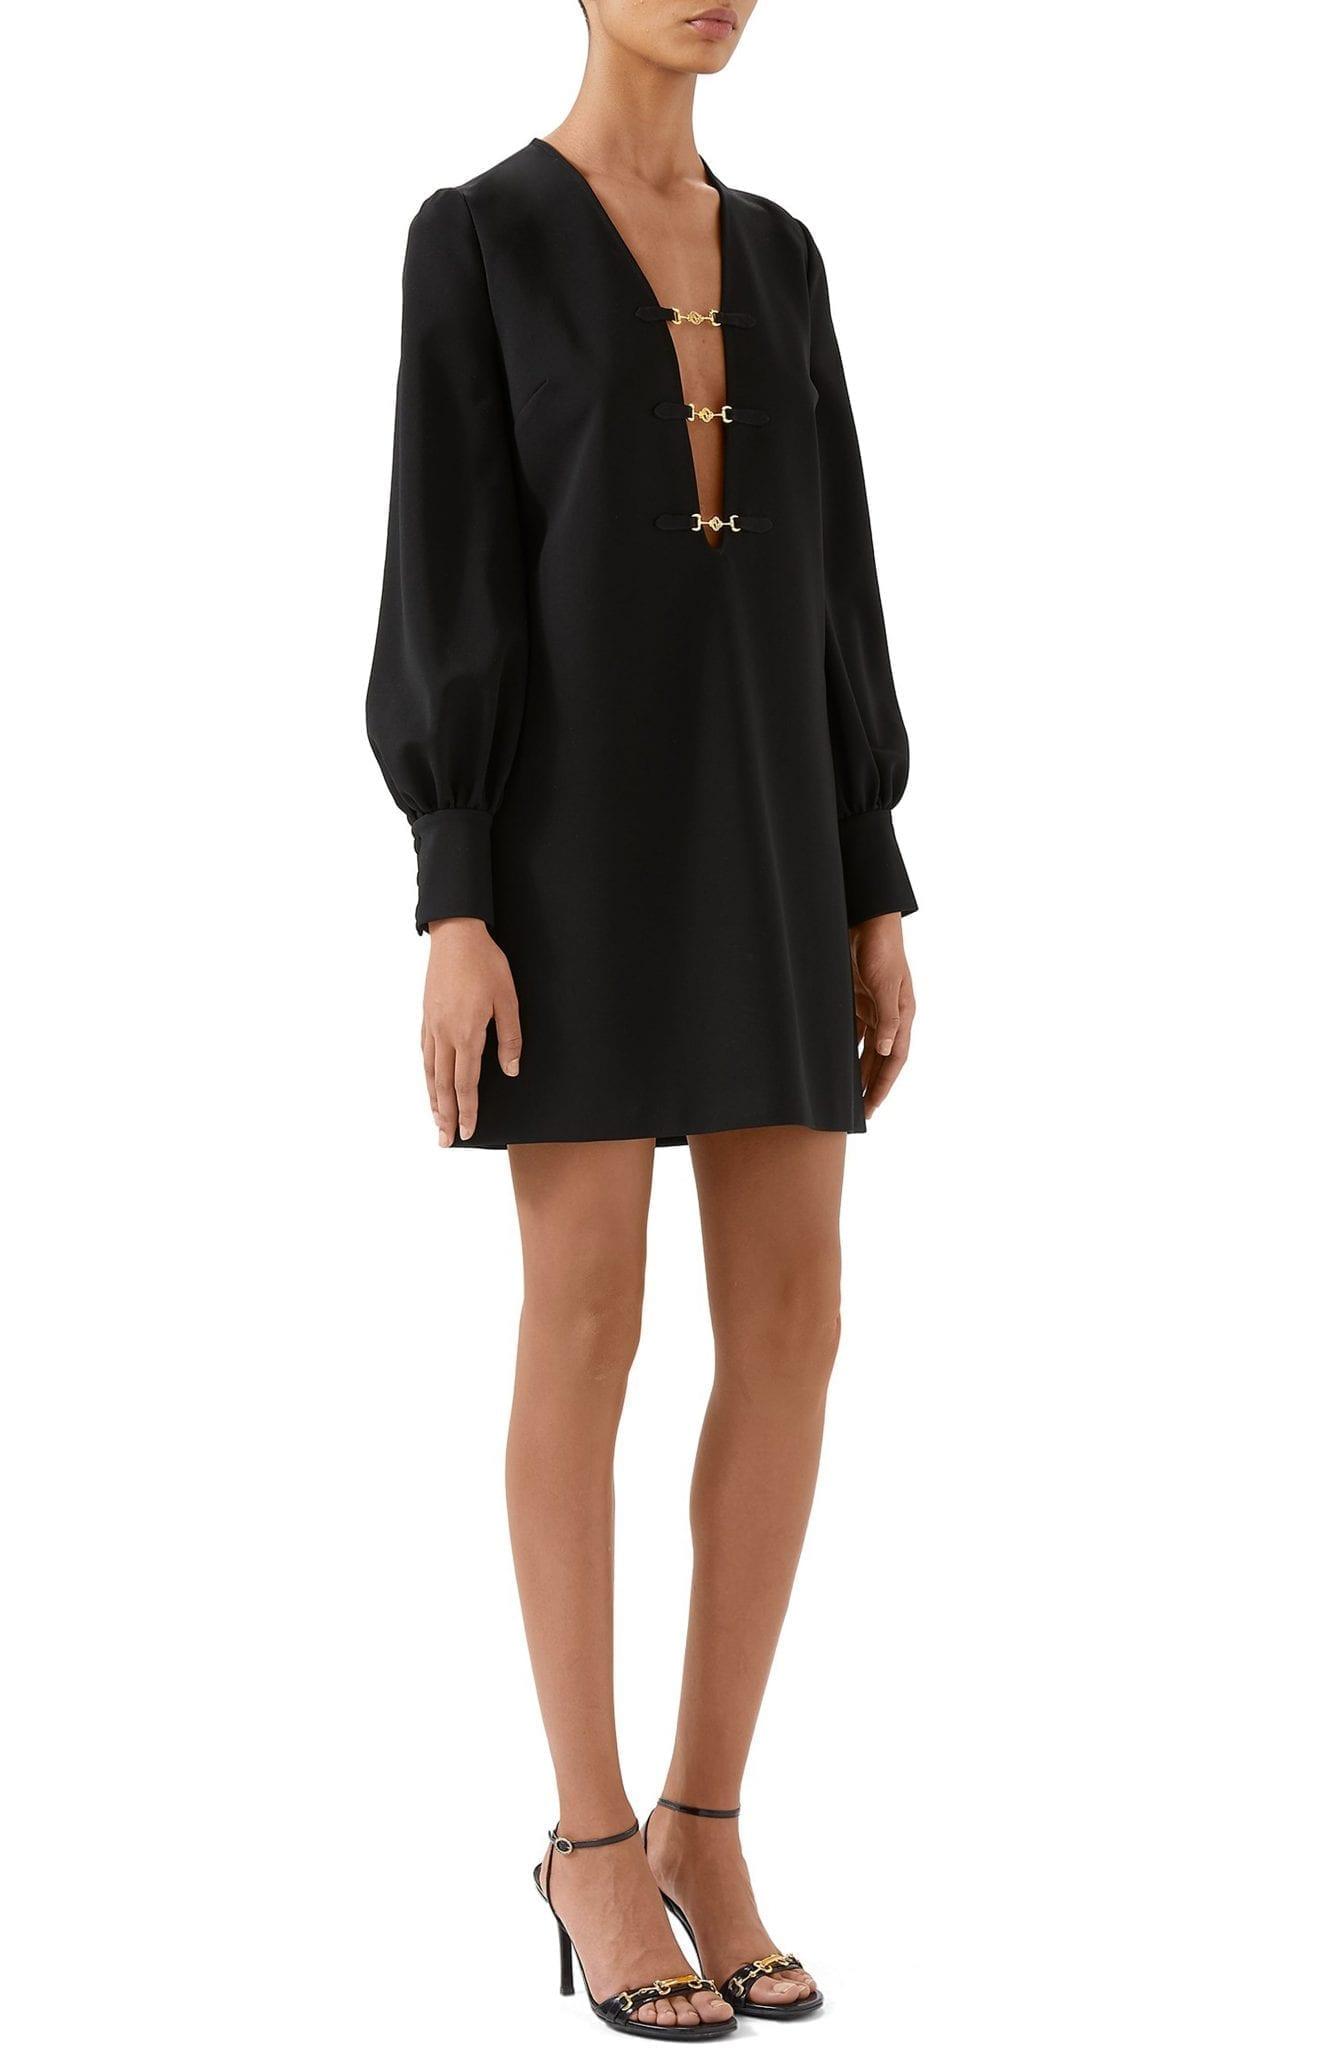 GUCCI Interlocking-G Horsebit Long Sleeve Compact Stretch Jersey Mini Dress